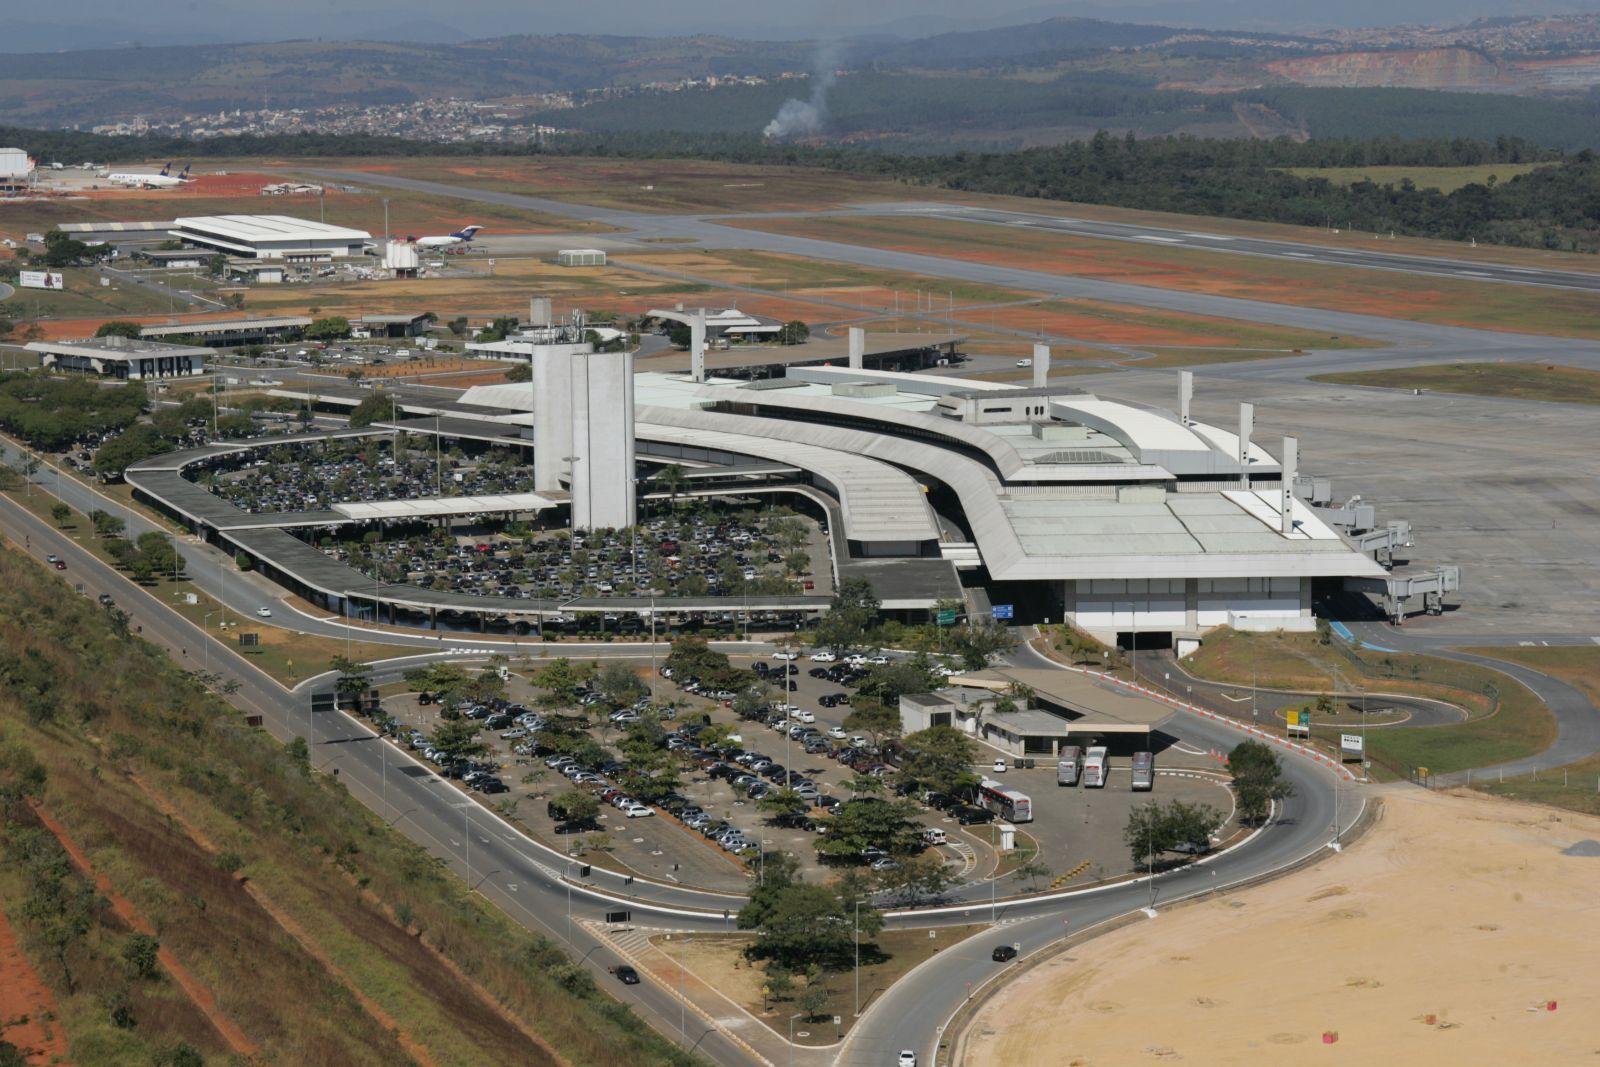 aeroporto-internacional-tancredo-neves-confins